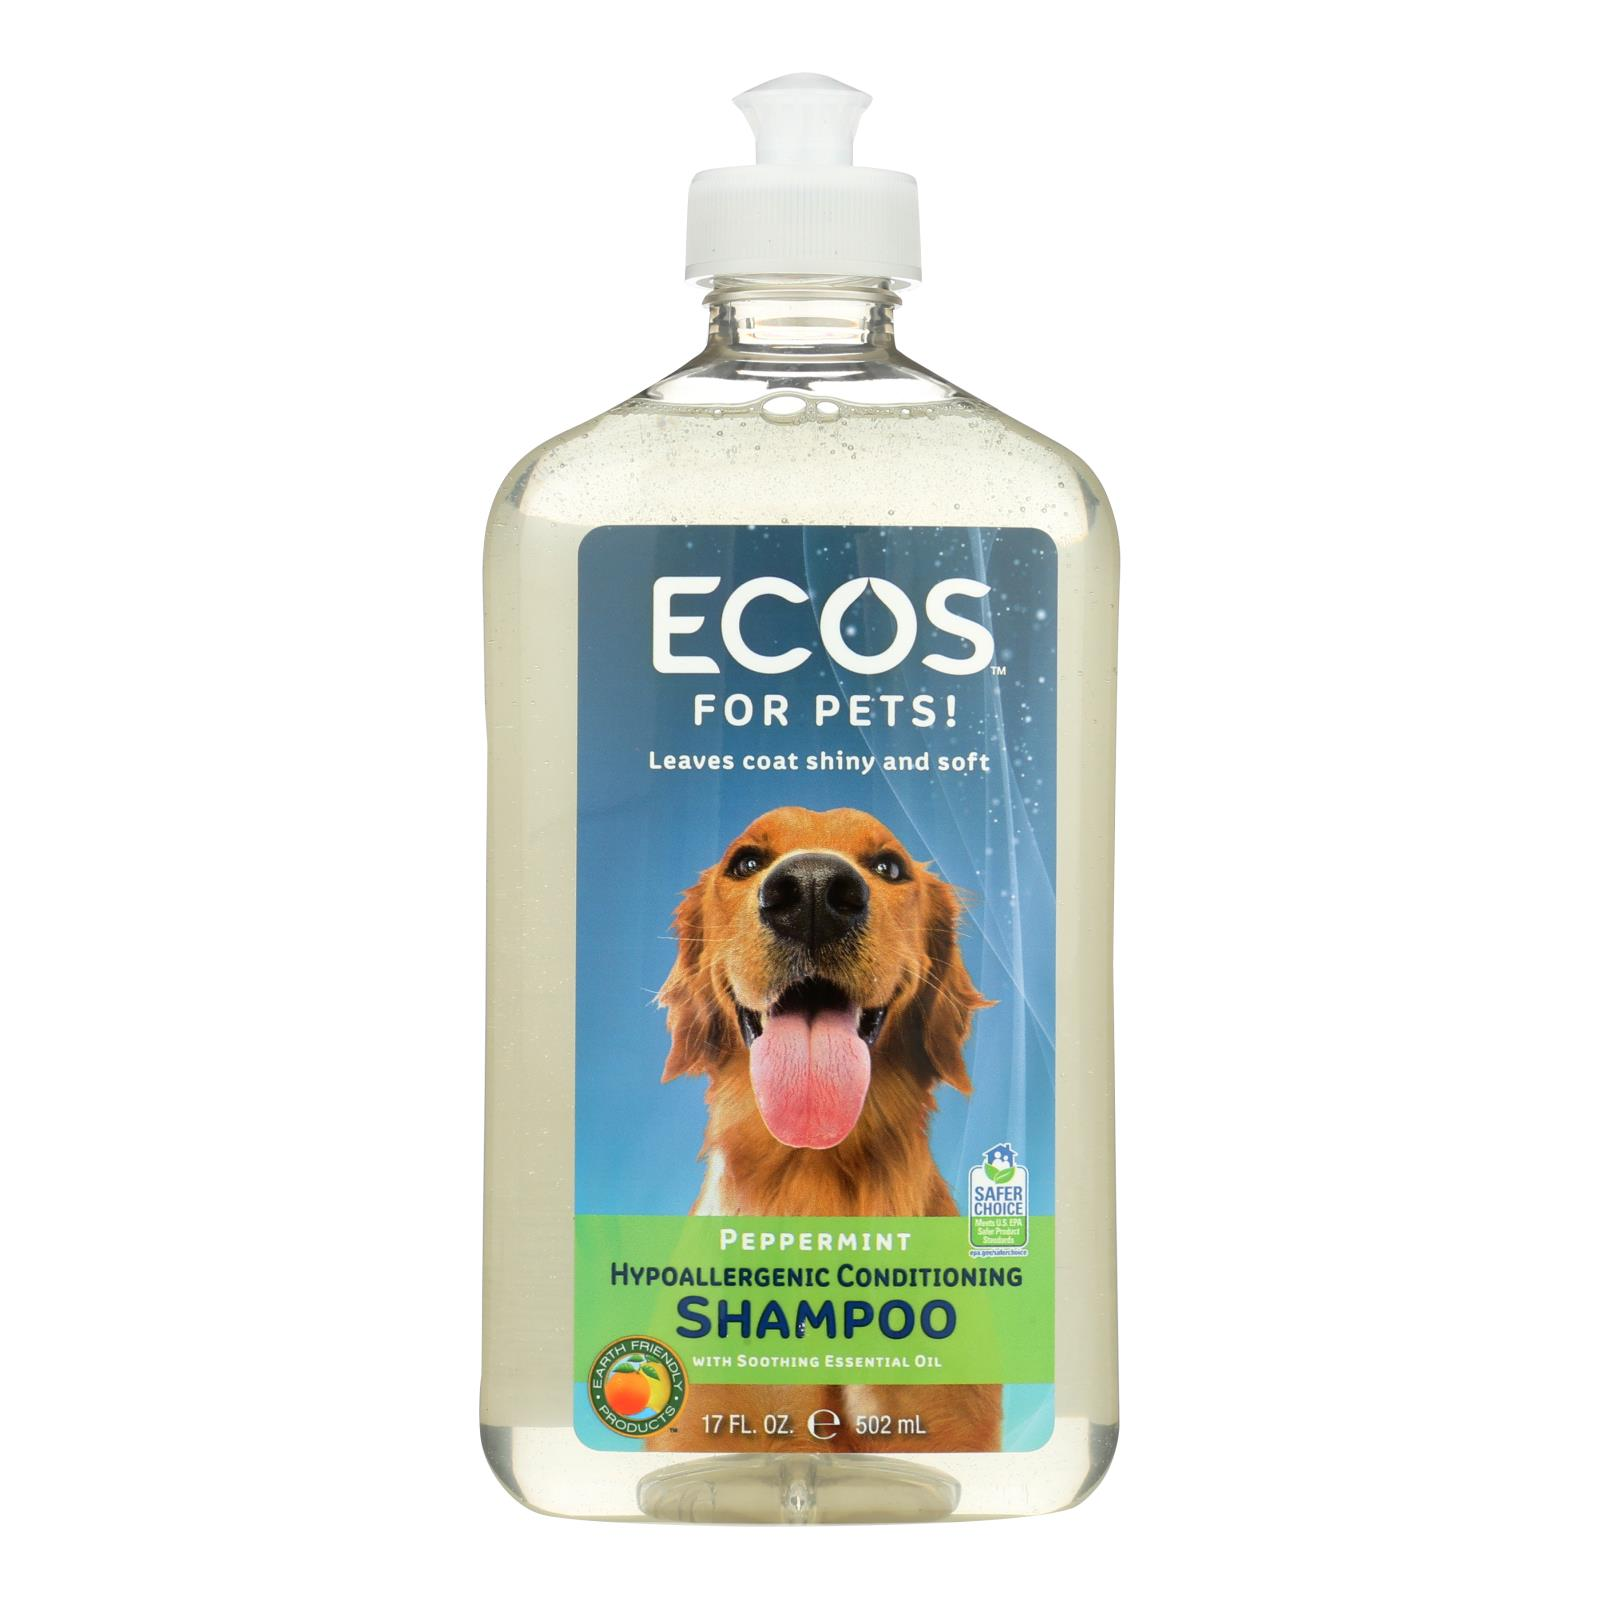 ECOS - Hypoallergenic Conditioning Pet Shampoo - Peppermint - 17 fl oz.